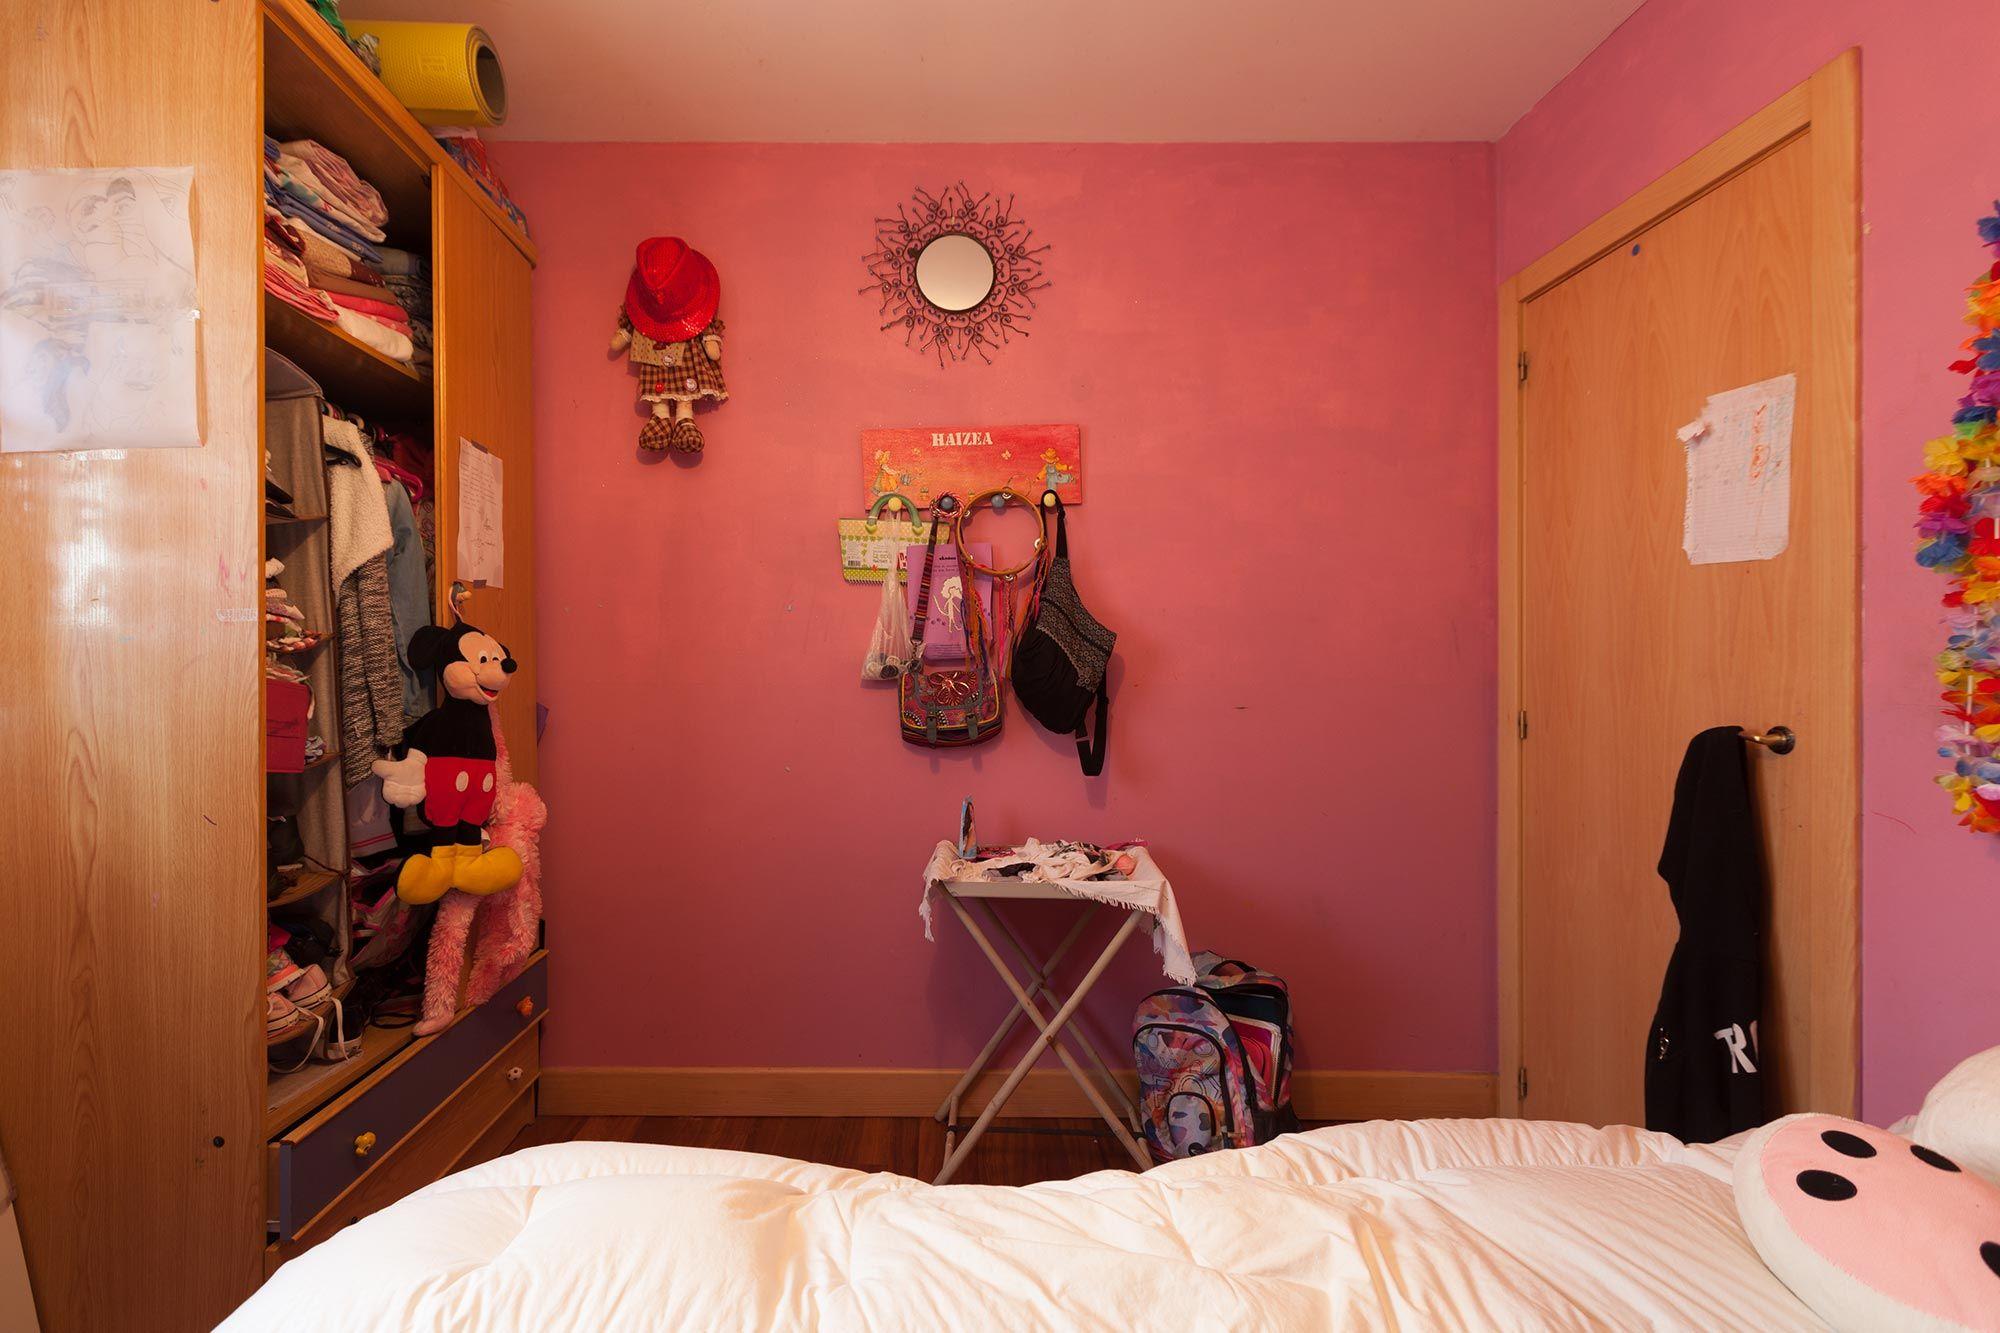 Programa de Decogarden del 29 diciembre de 2018 - dormitorio juvenil rosa antes